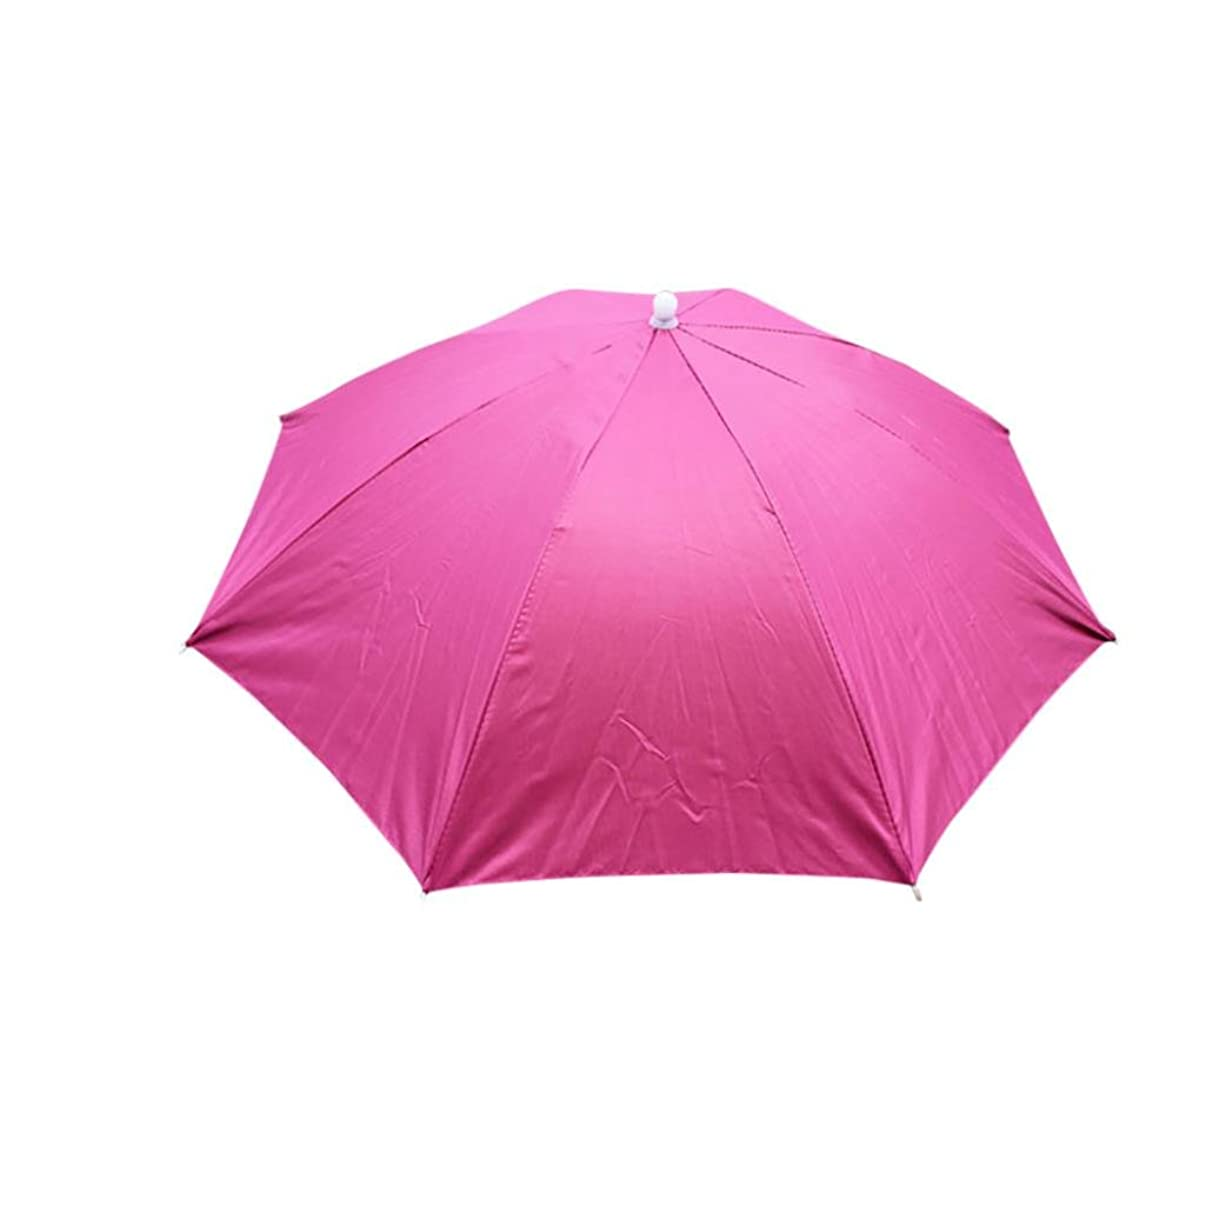 Kimloog Clearance!Sun & Rain Rainbow Umbrella Hat with Head Strap for Adults and Kids